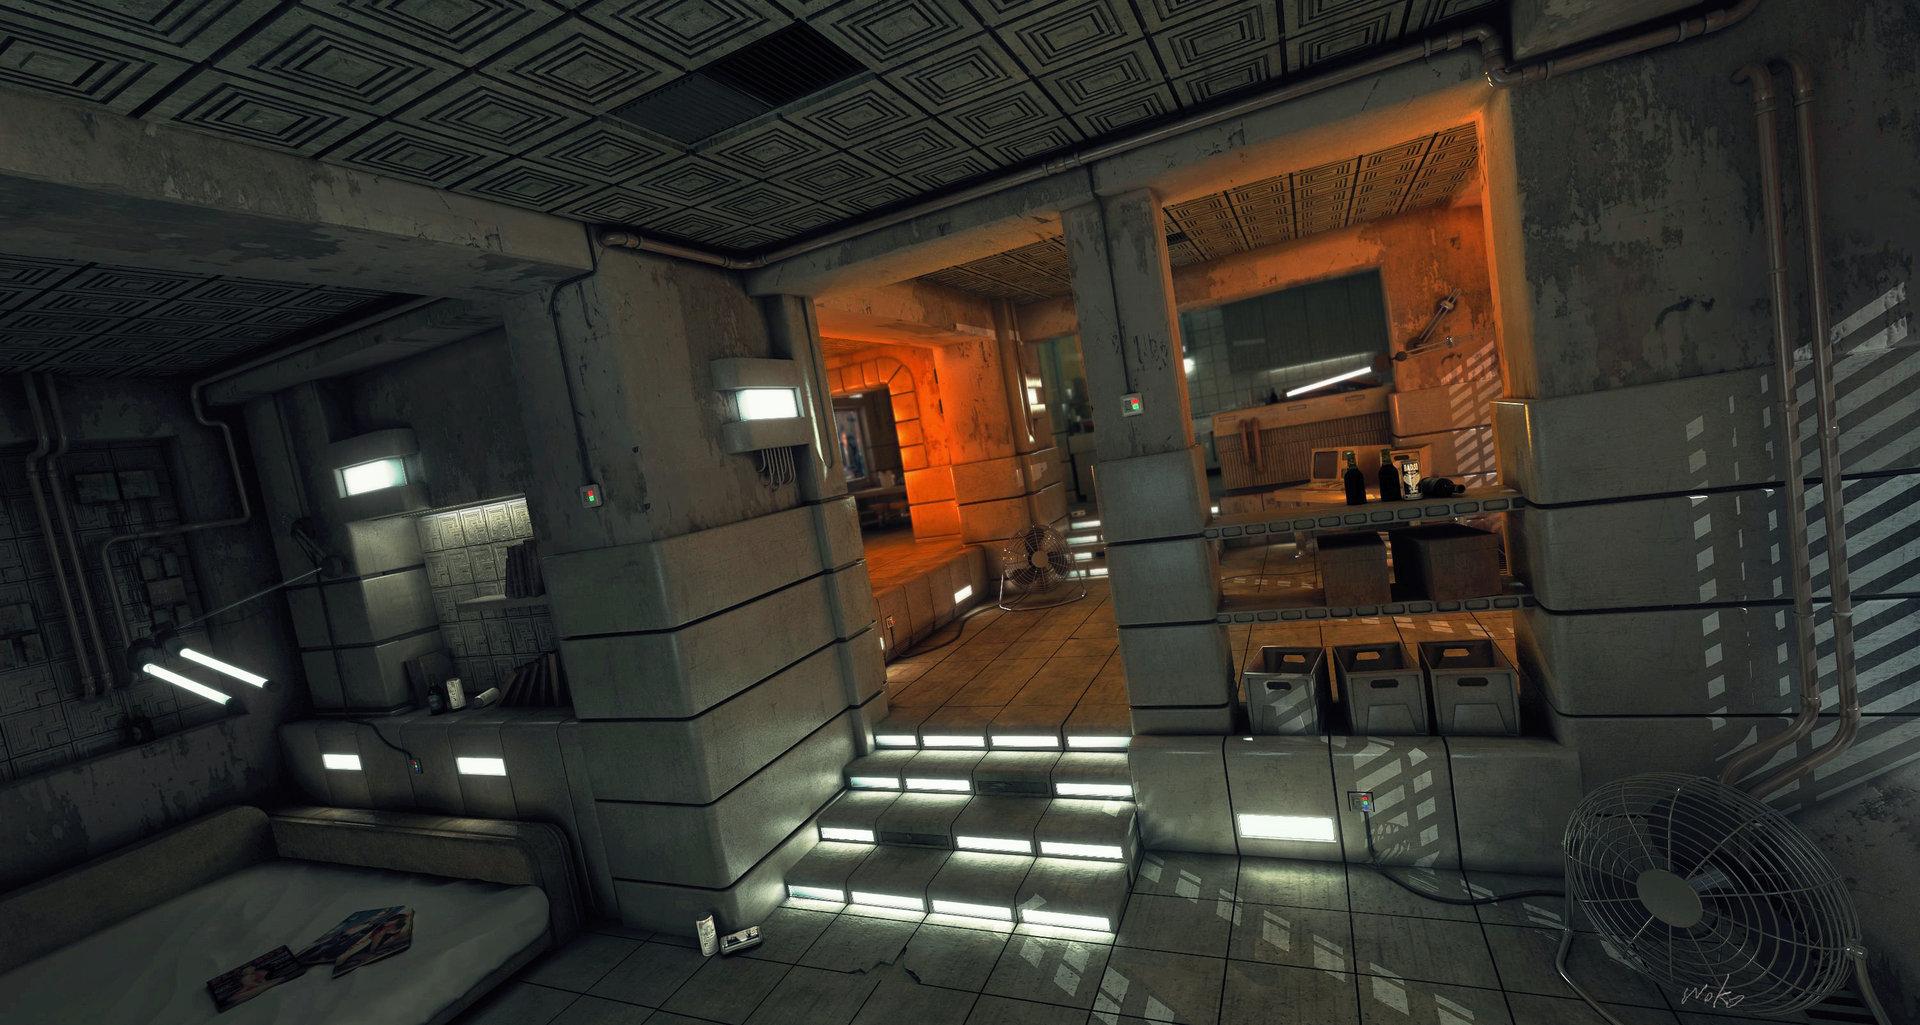 ArtStation  Blade Runner Inspired Apartment study, Rob Watkins